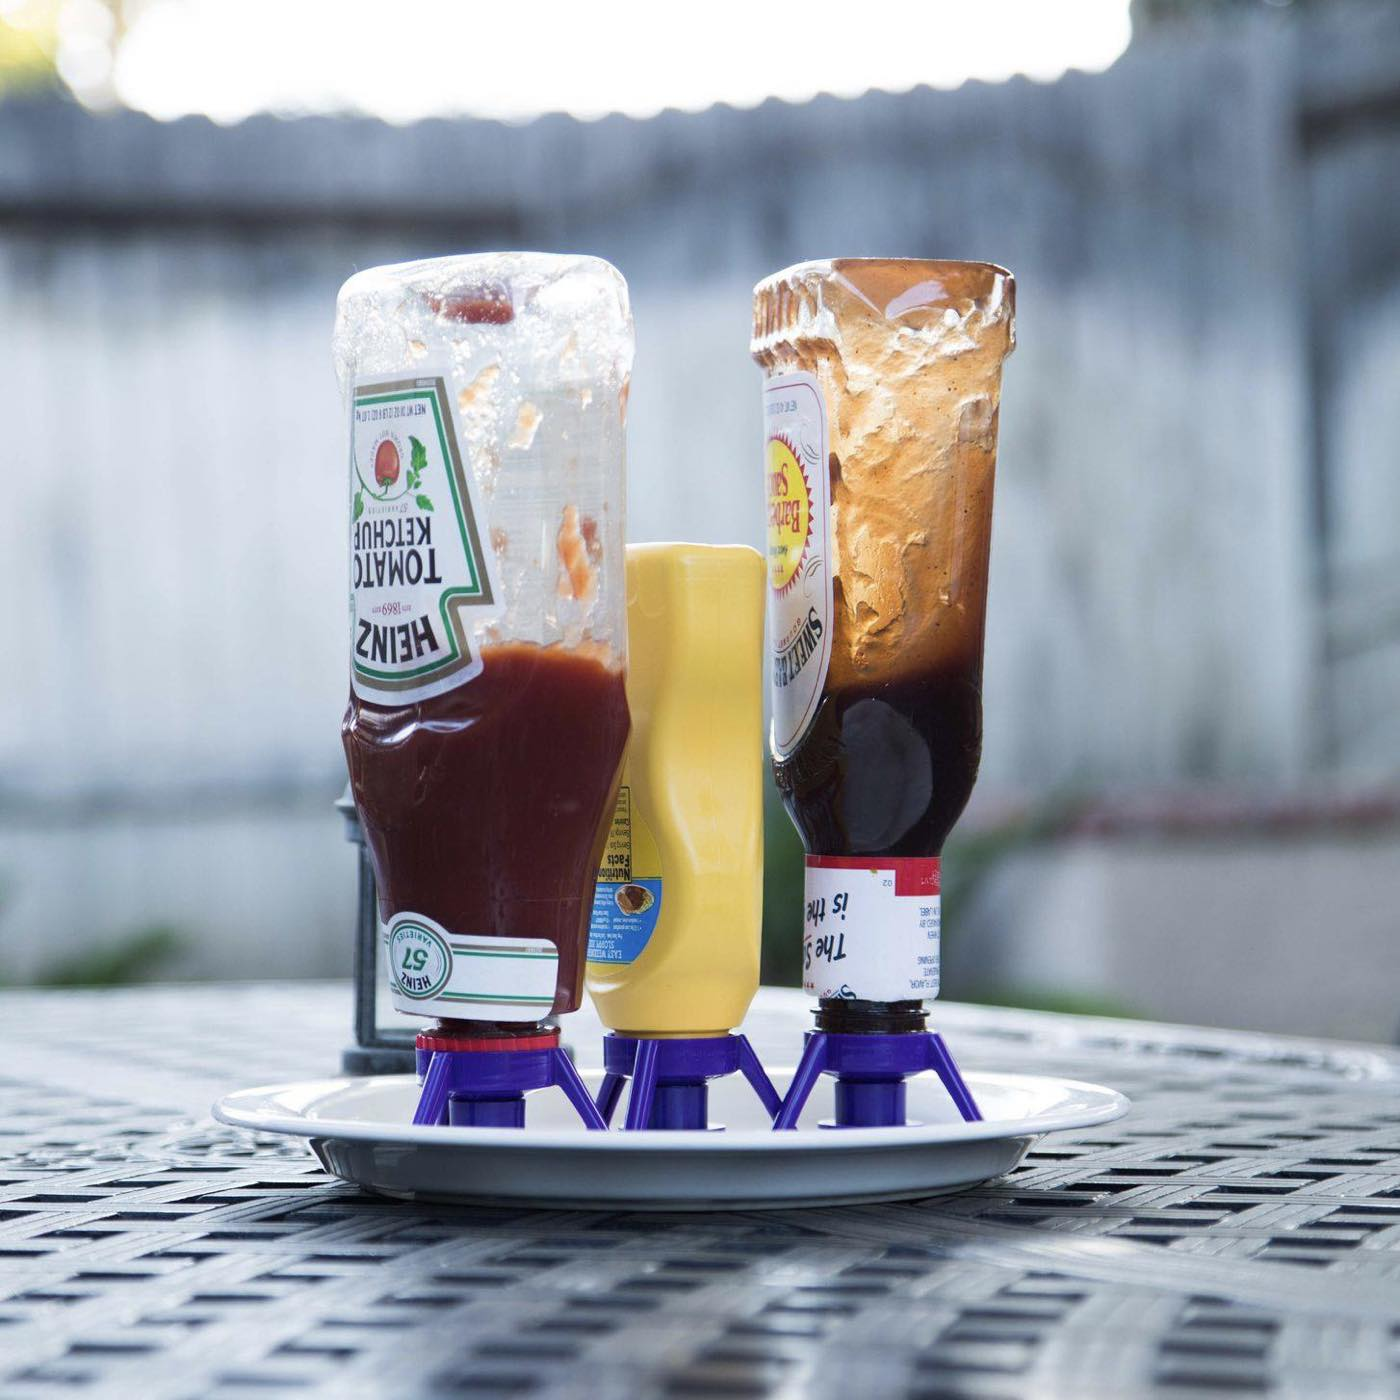 flip-it-bottle-emptying-kits-condiments